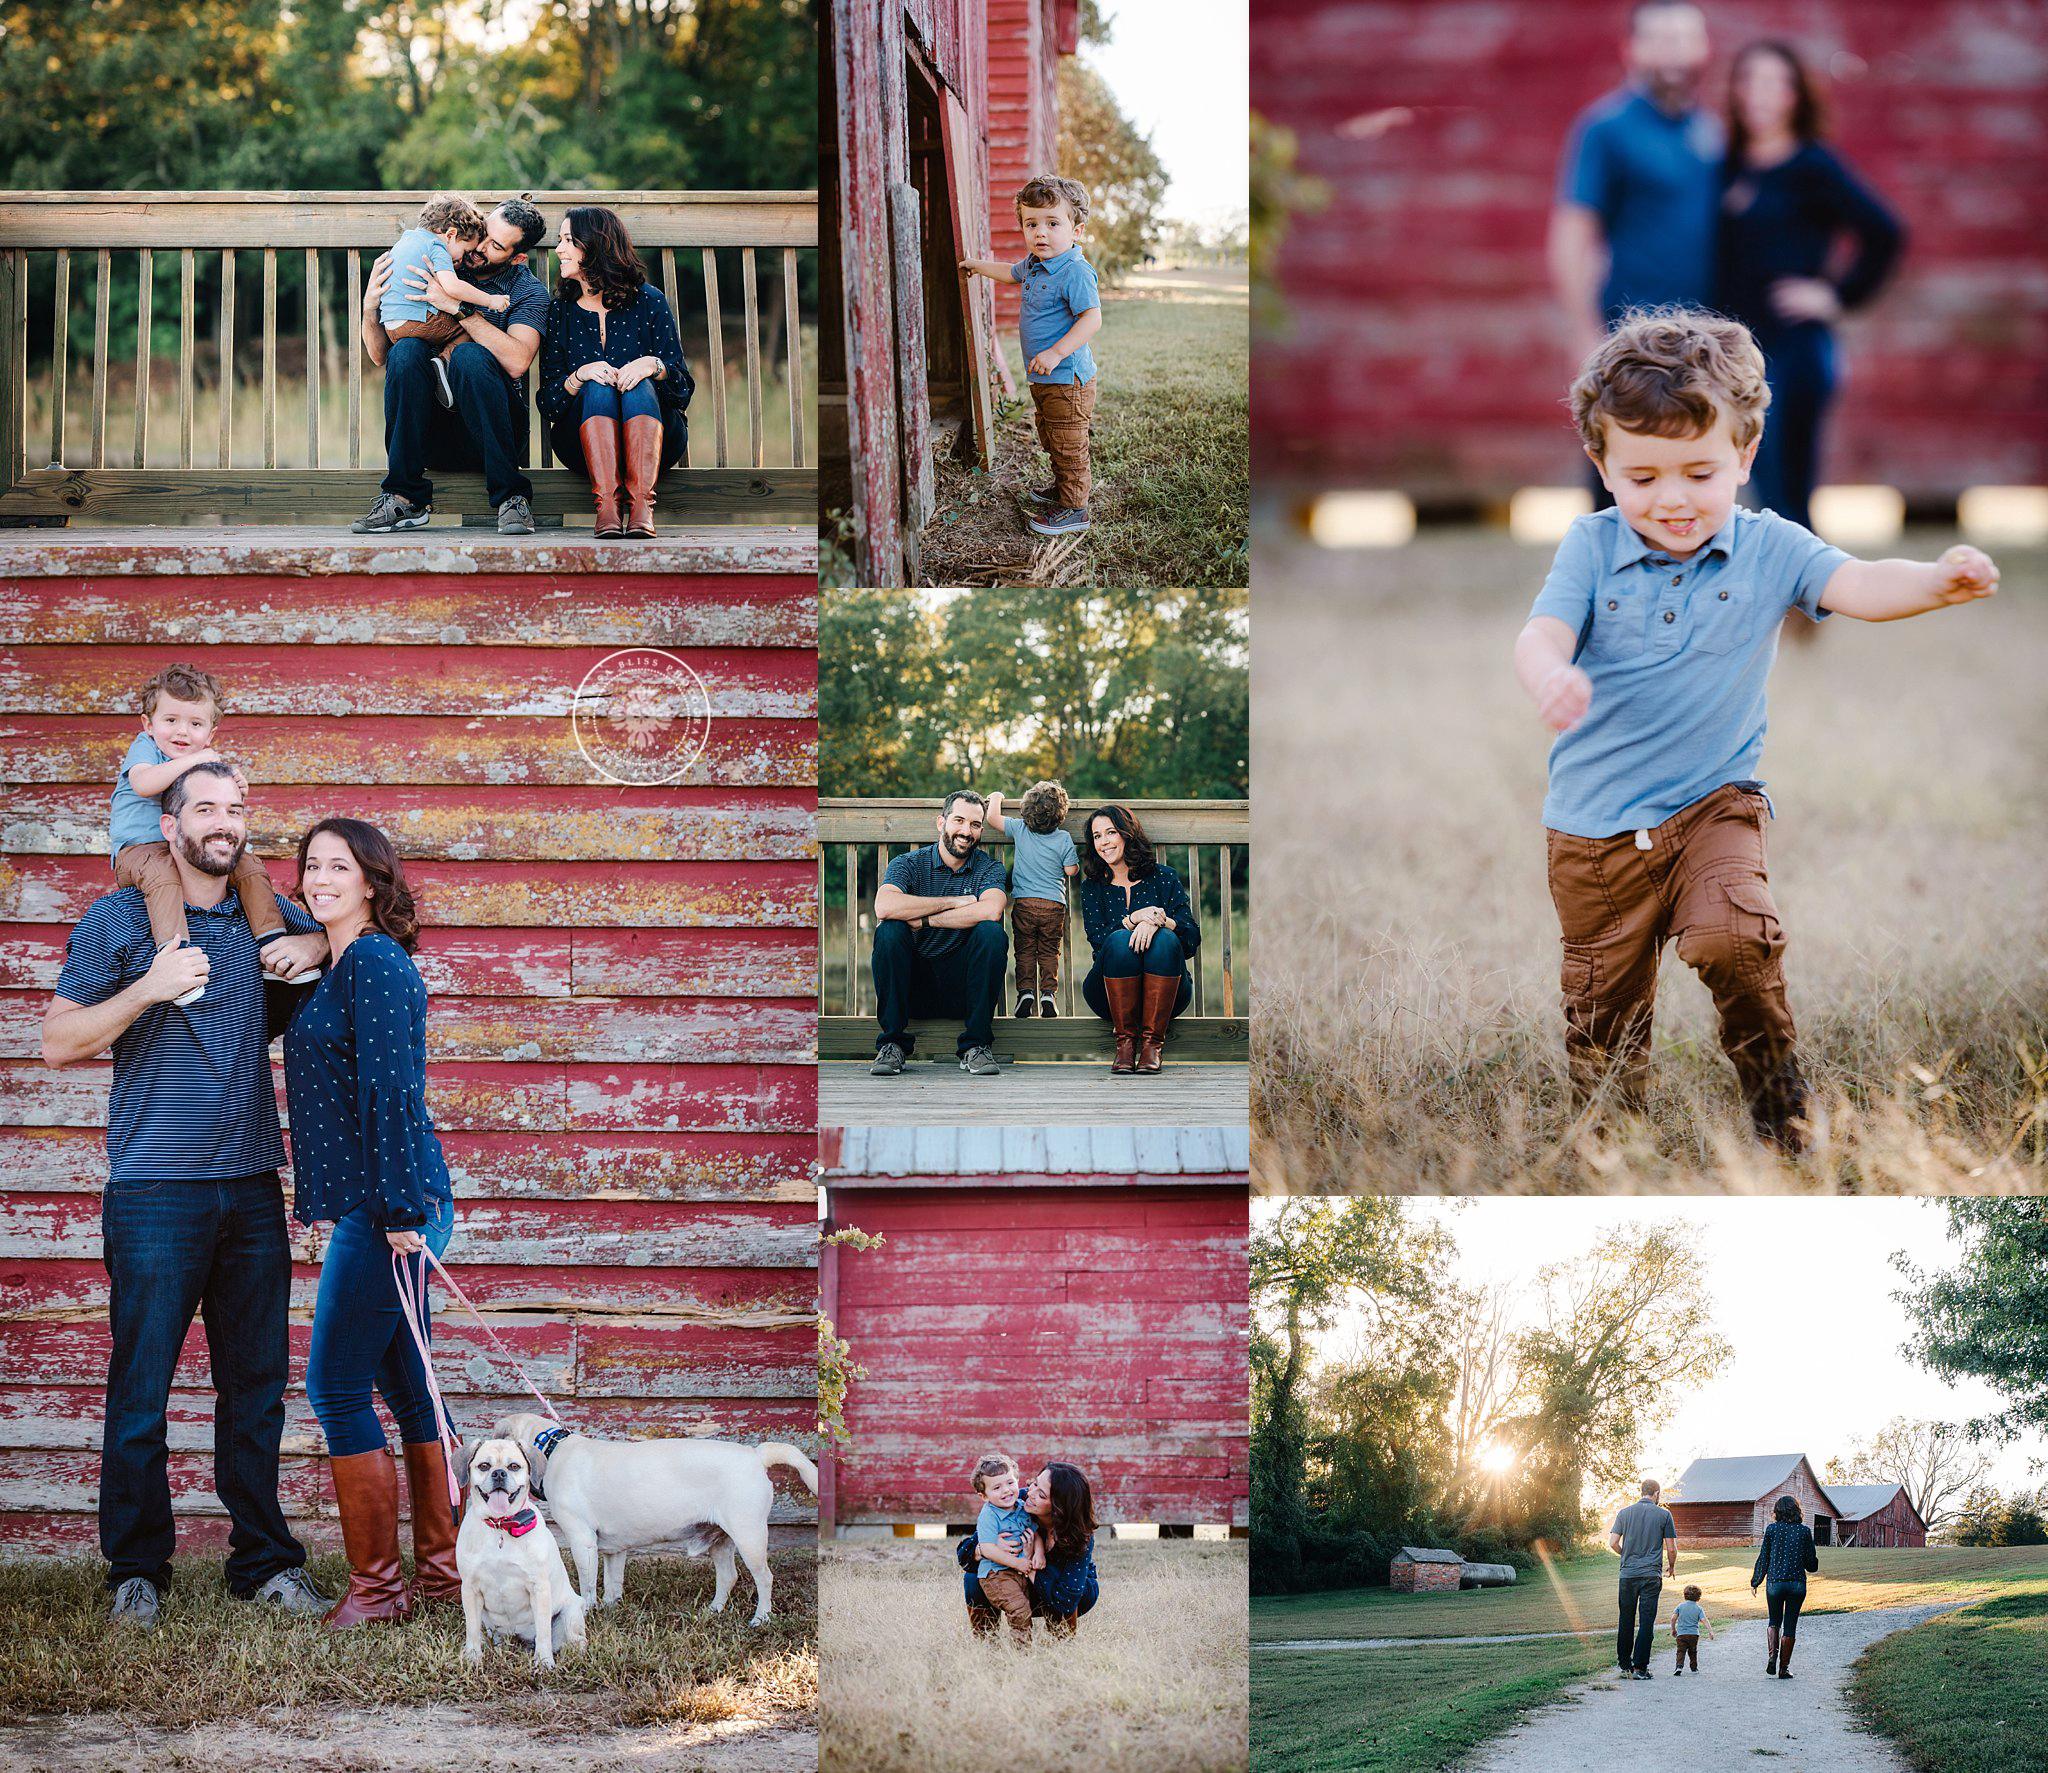 norfolk-virginia-beach-chesapeake-family-photographers-windsor-castle-park-lifestyle-family-session-melissa-bliss-photography-hampton-roads